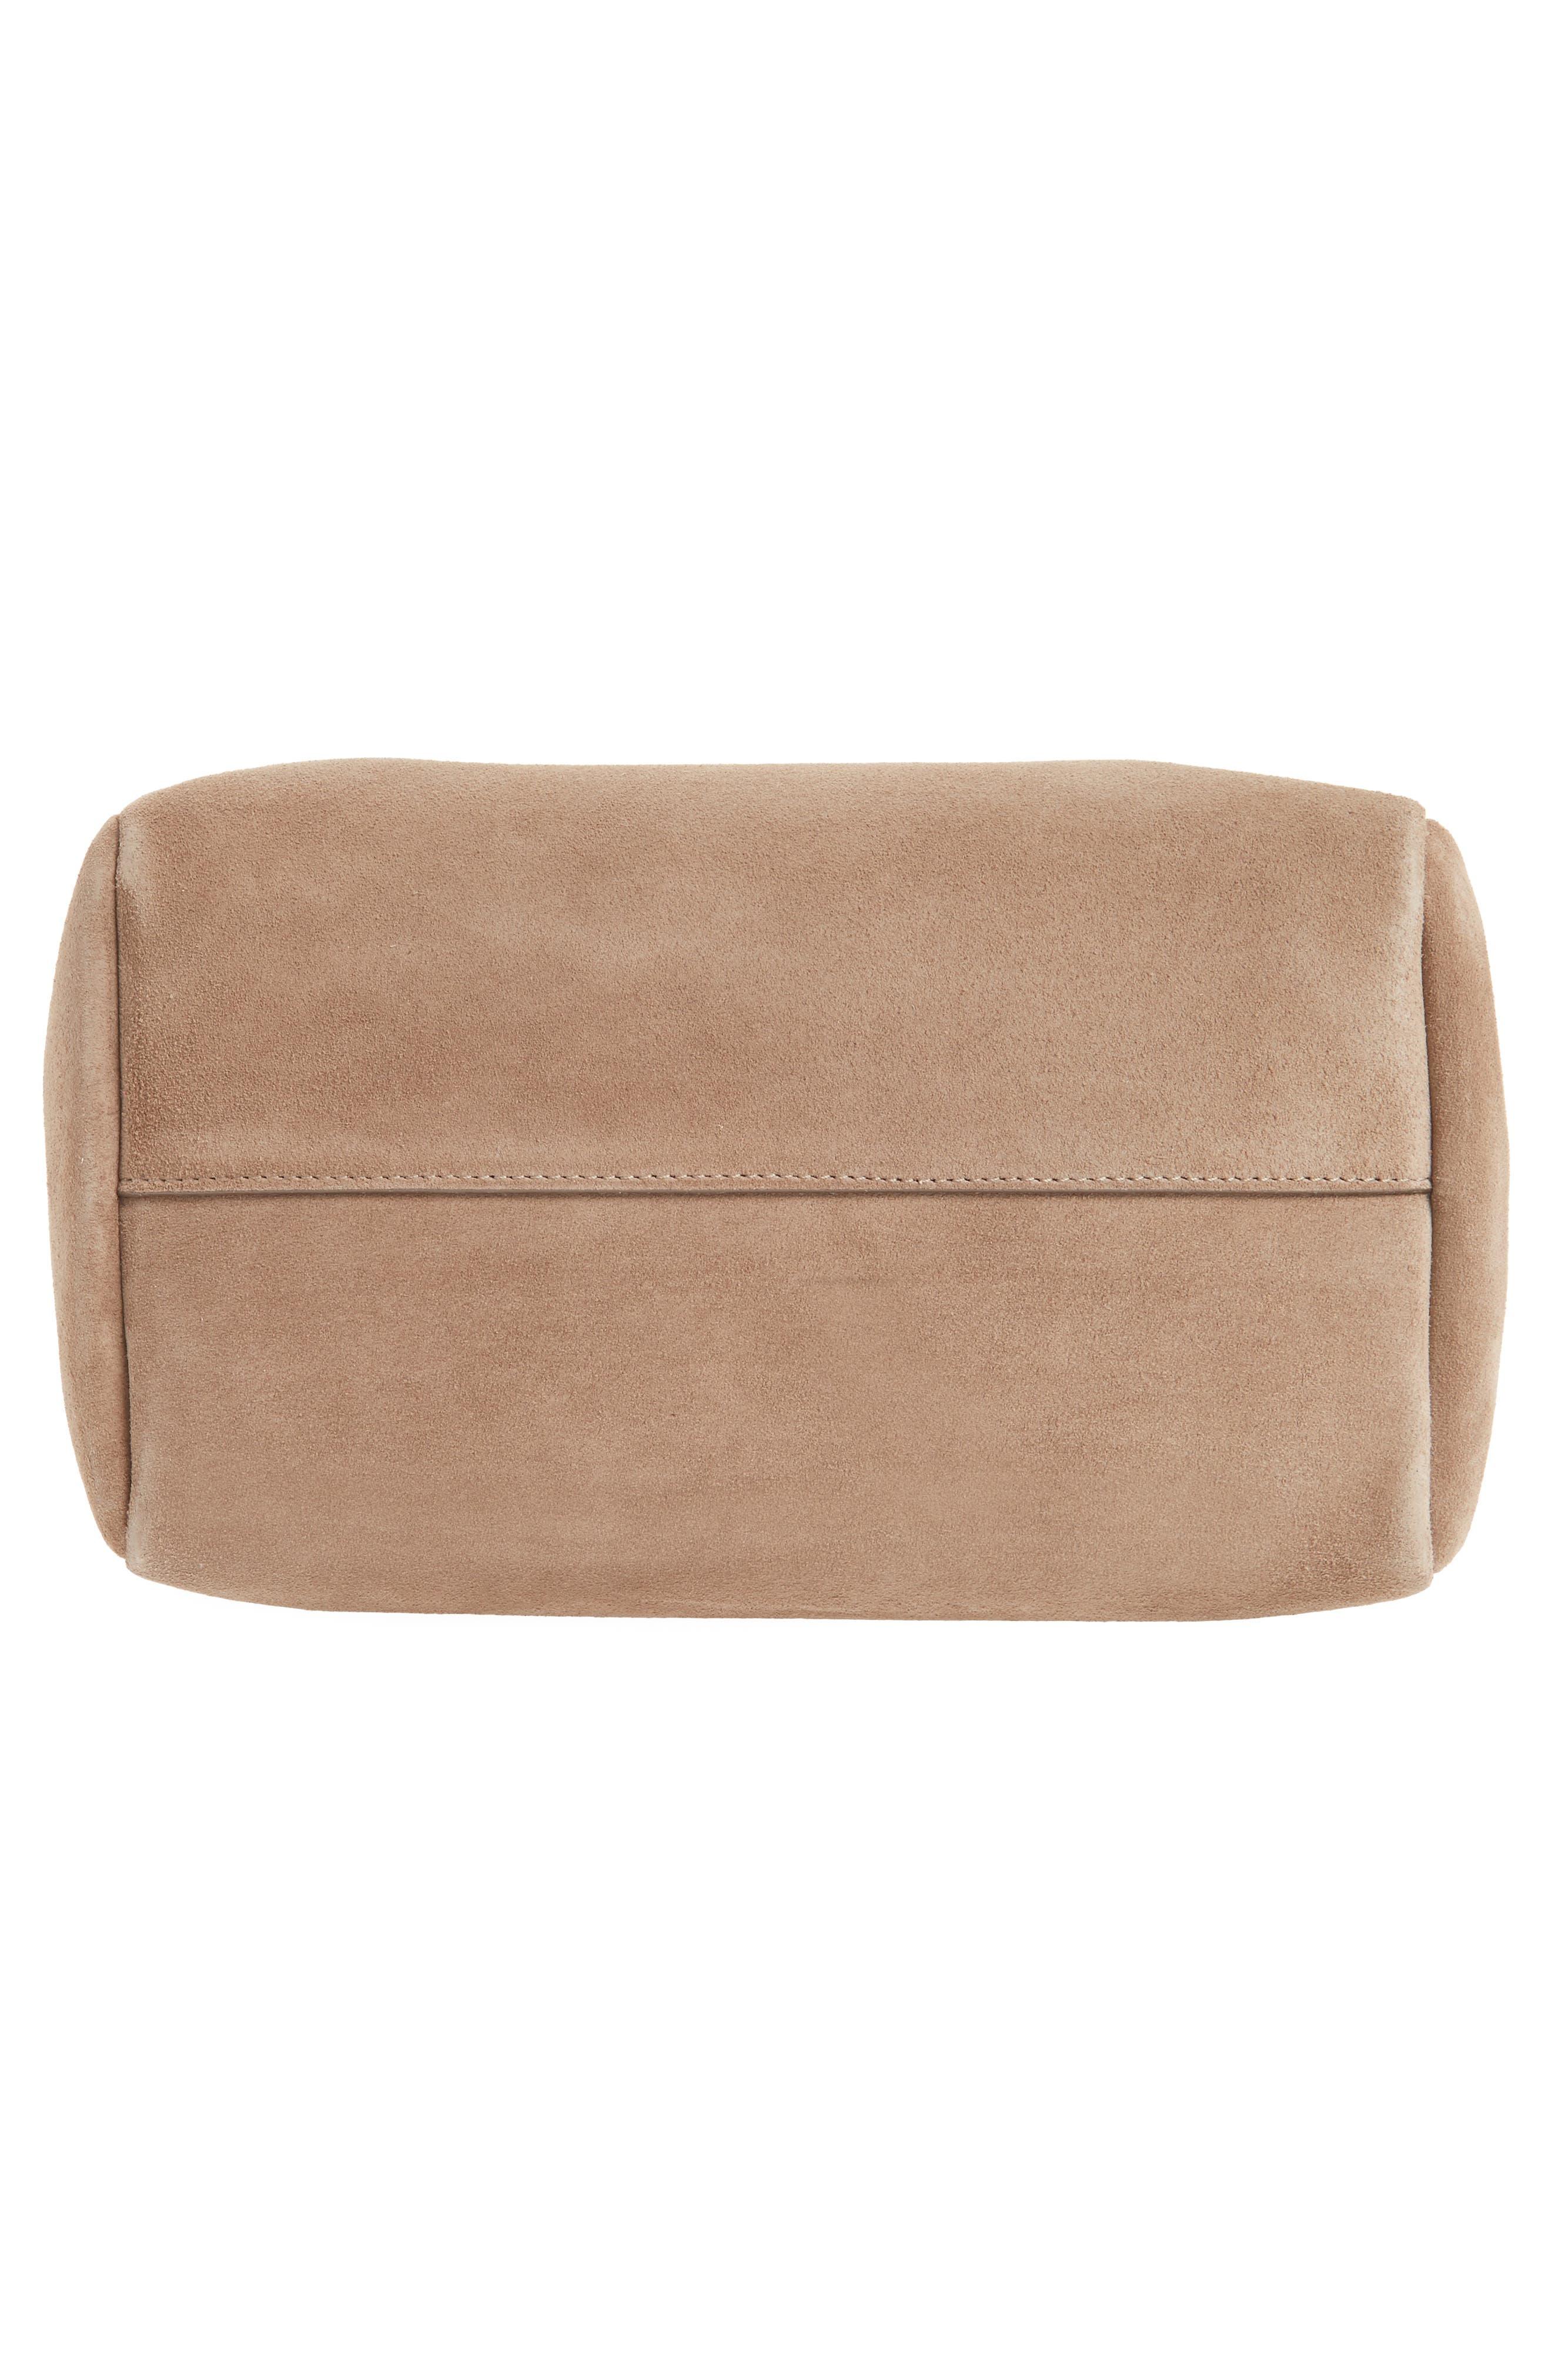 Small Allie Nappa Leather Bowling Bag,                             Alternate thumbnail 6, color,                             Light Mocha